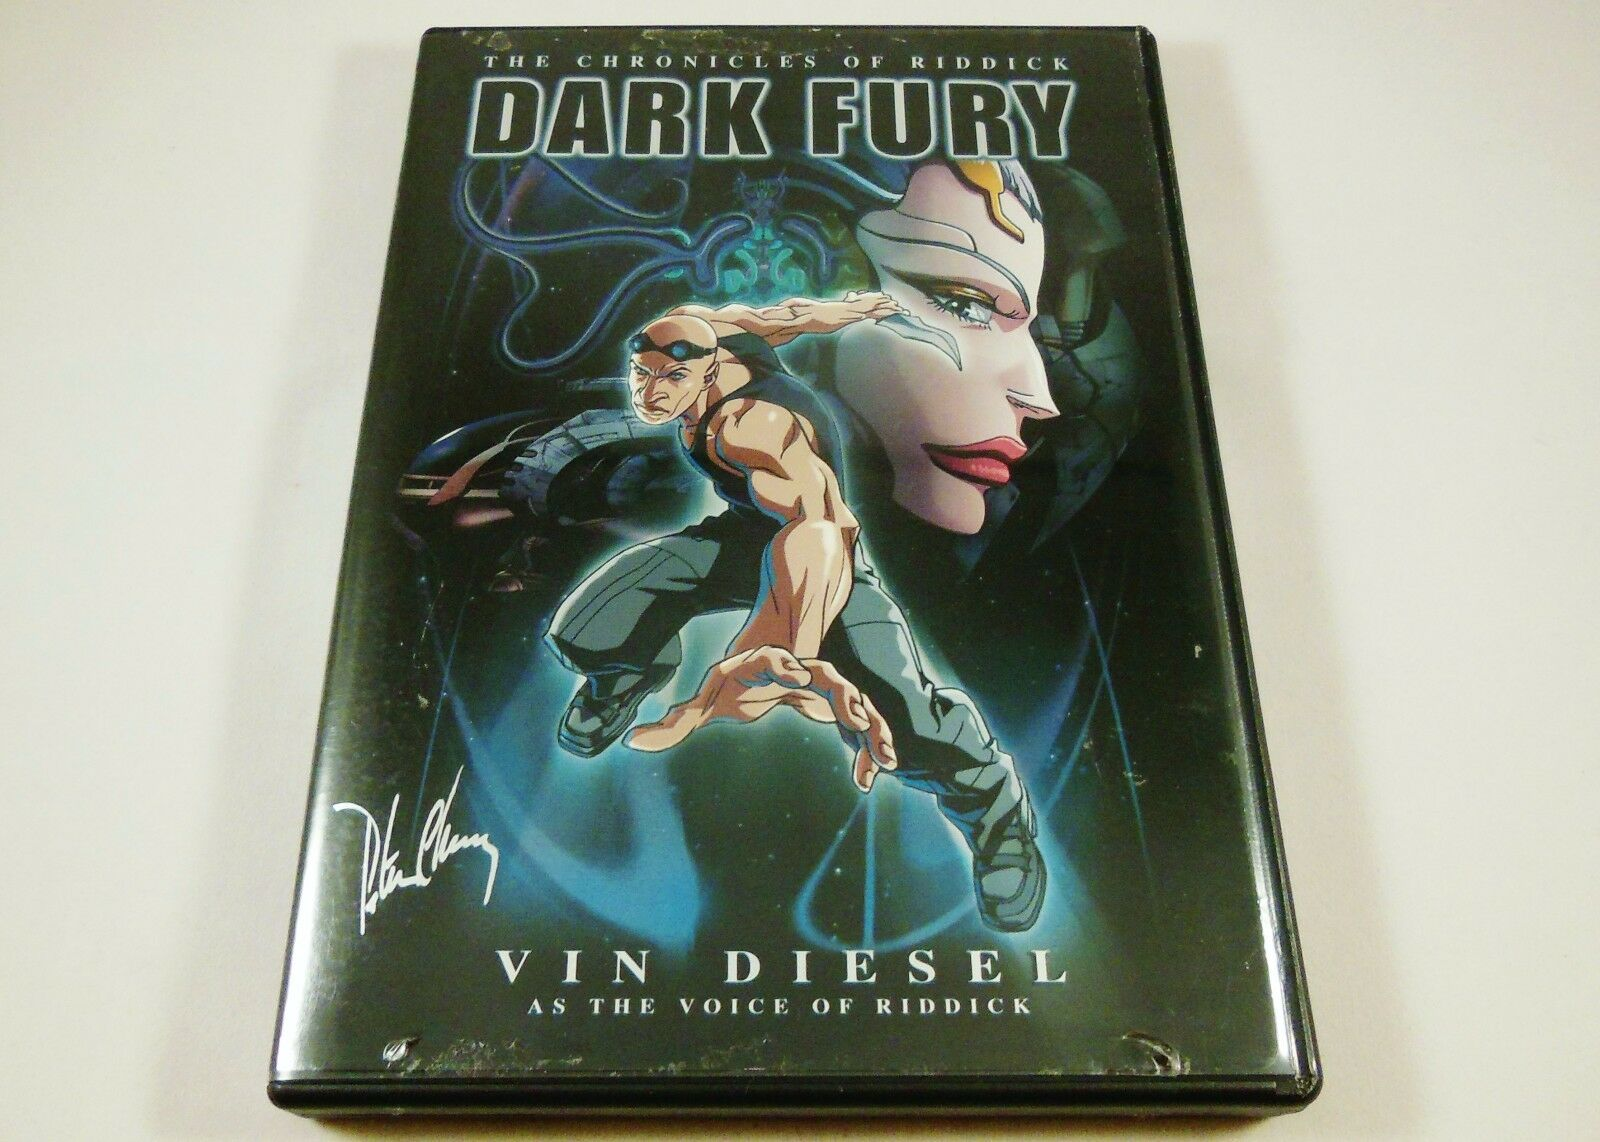 The Chronicles of Riddick - Dark Fury DVD Vin Diesel, Rhiana Griffith